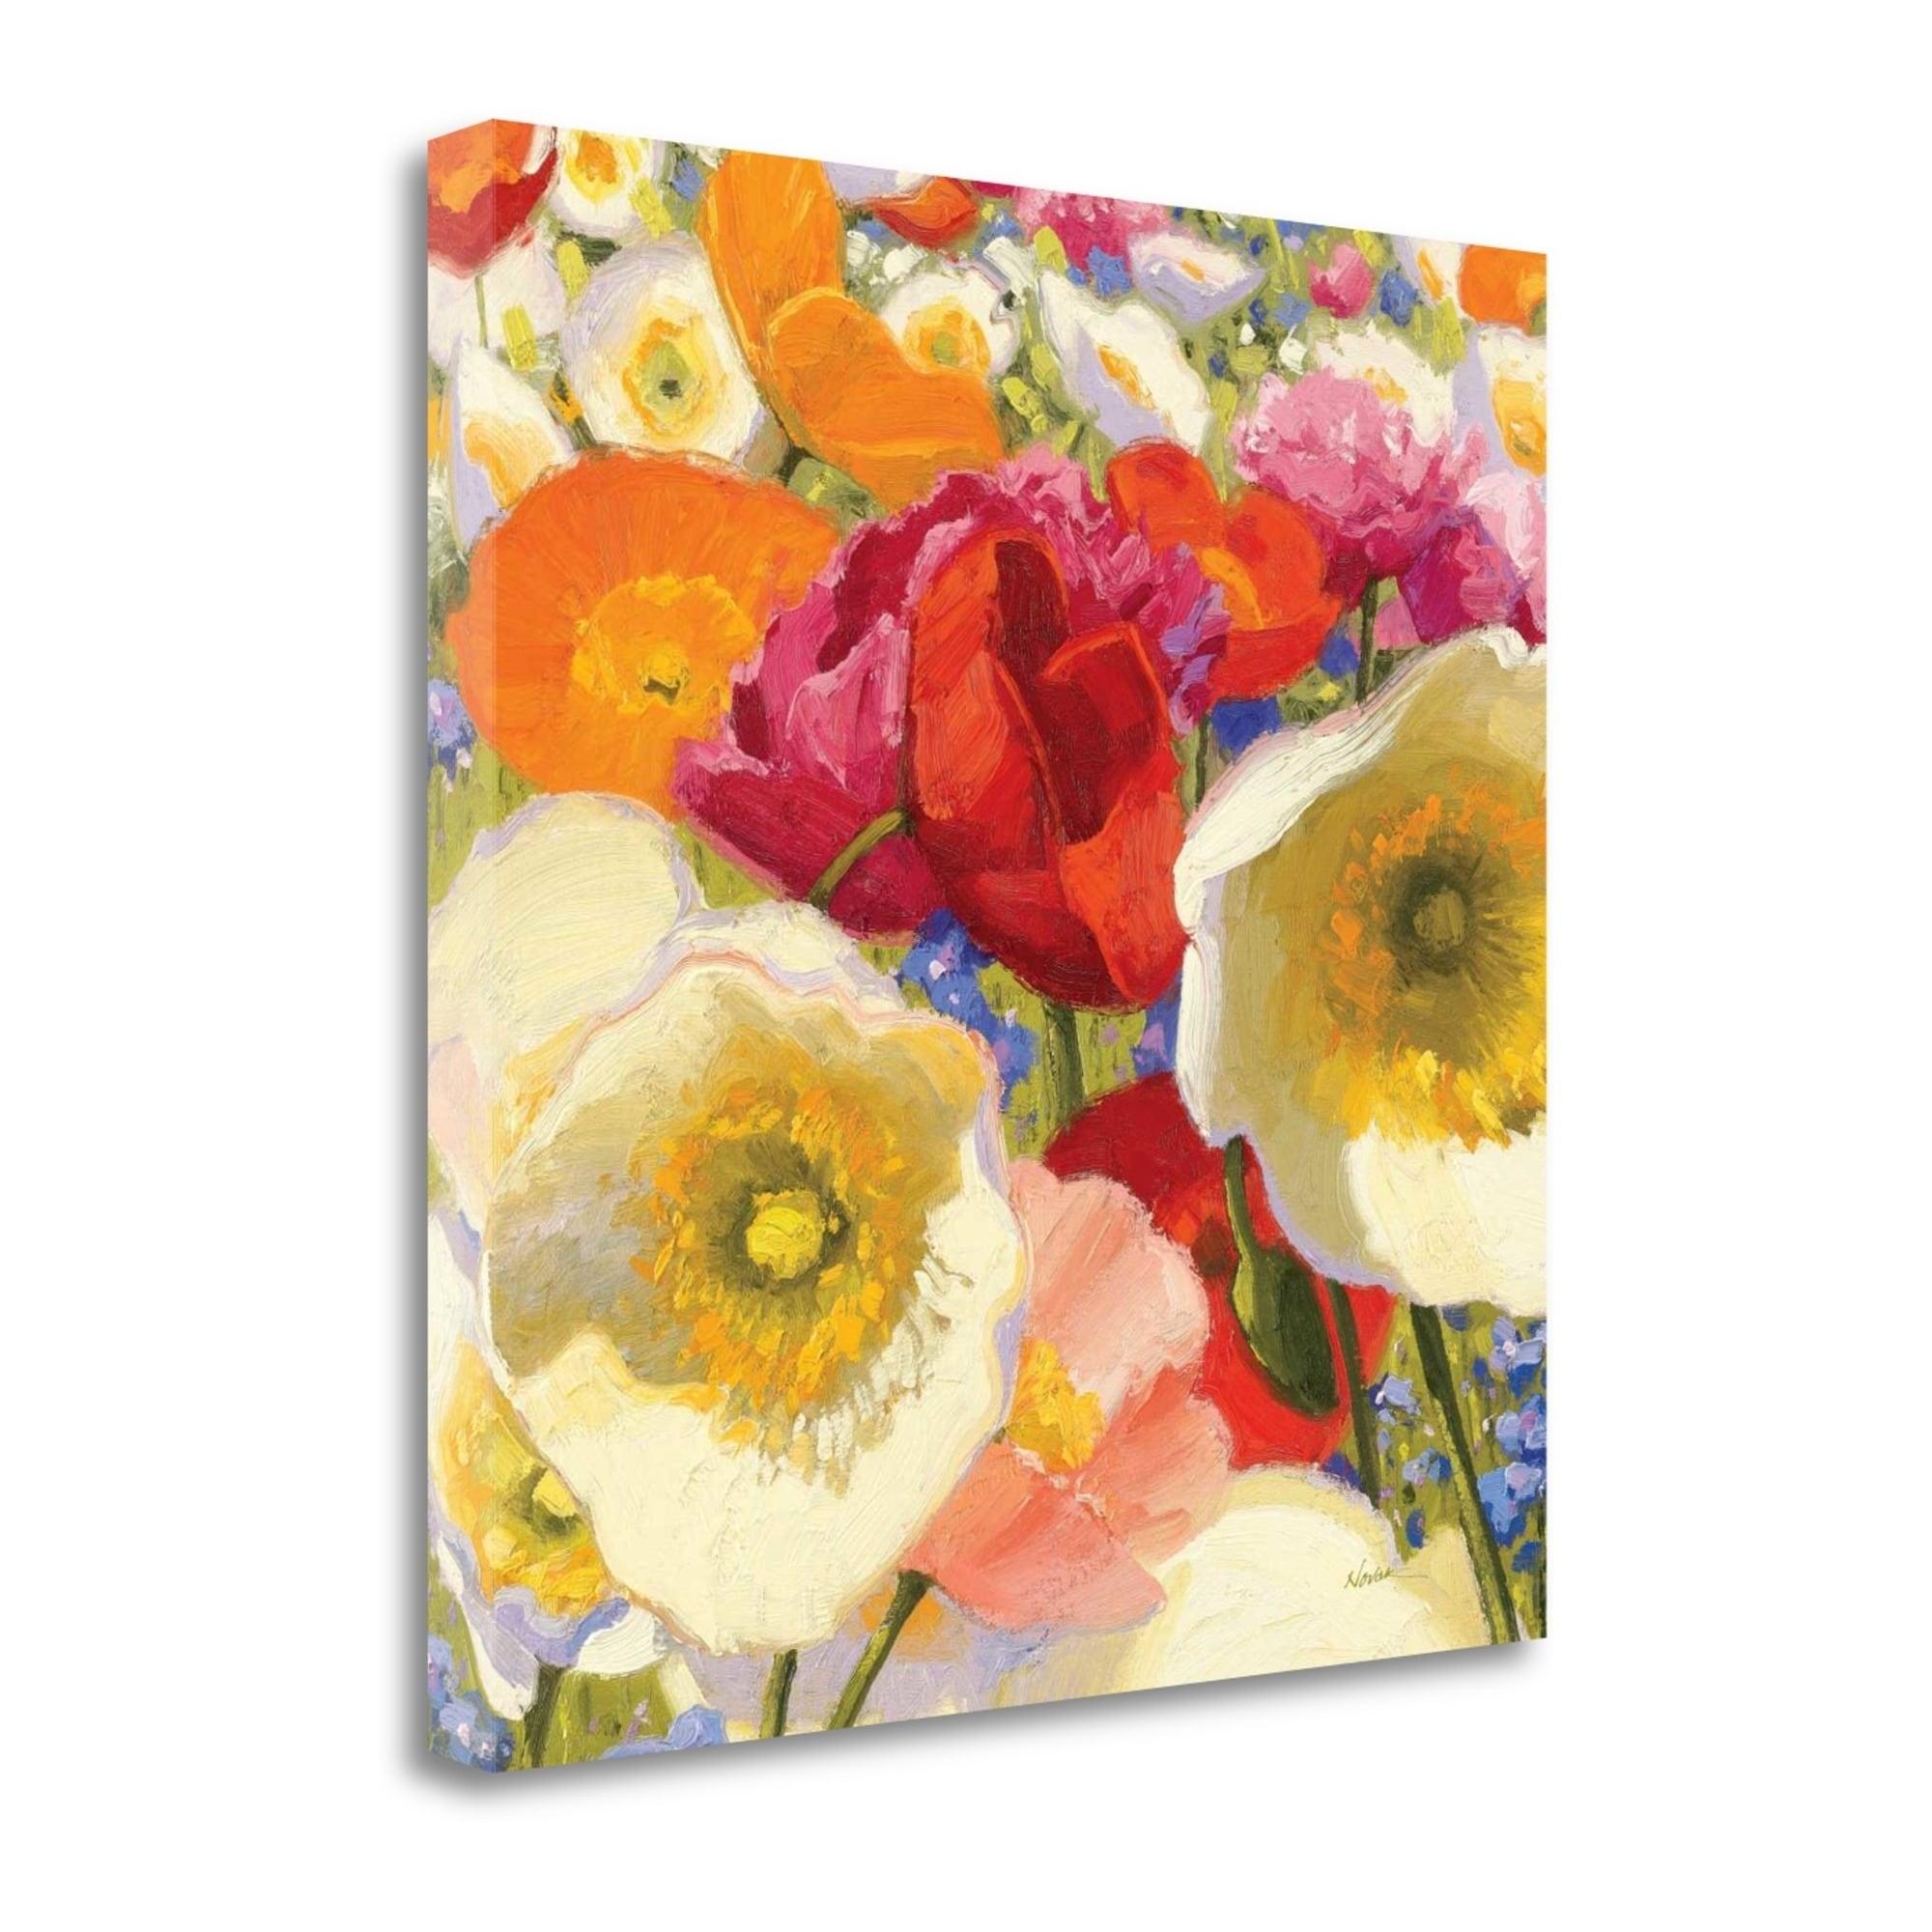 Sunny Abundance Ii By Shirley Novak Fine Art Giclee Print On Gallery Wrap Canvas Ready To Hang Overstock 30299363